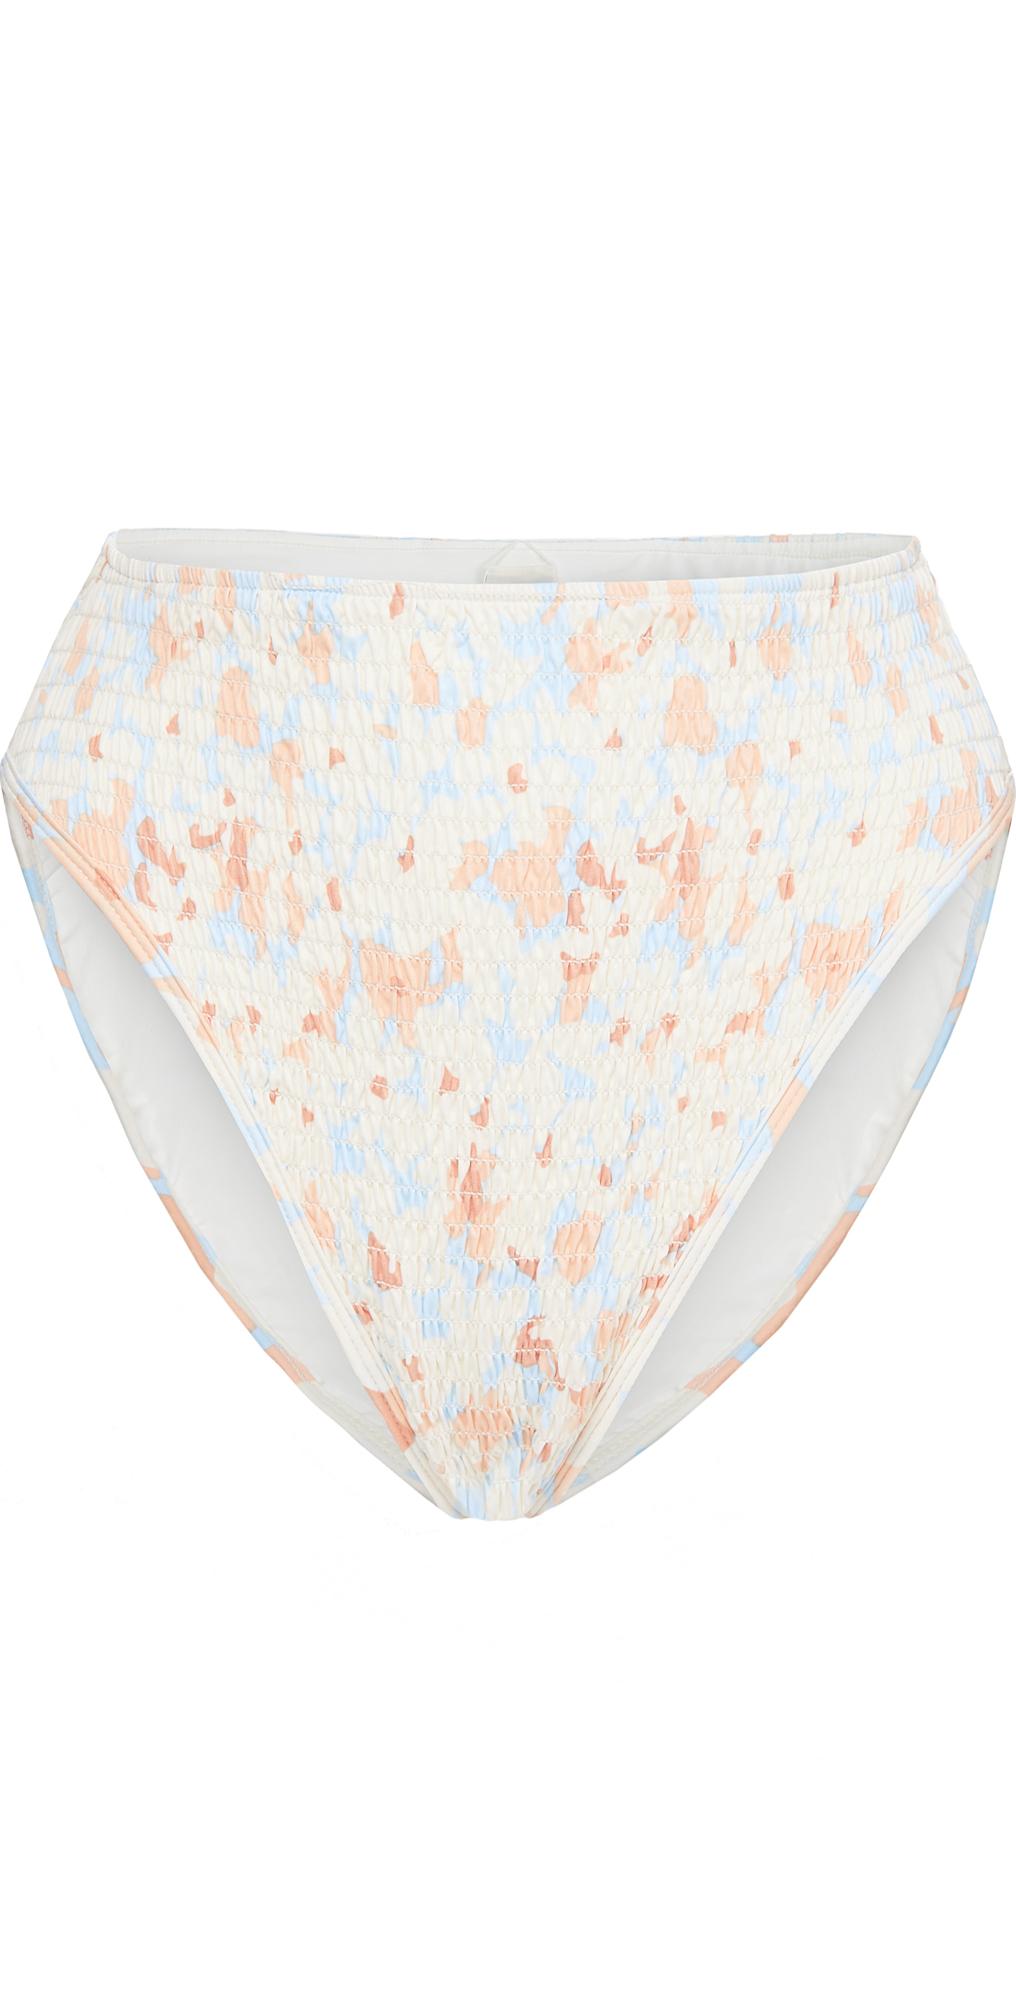 L*Space Barlette Bikini Bottoms